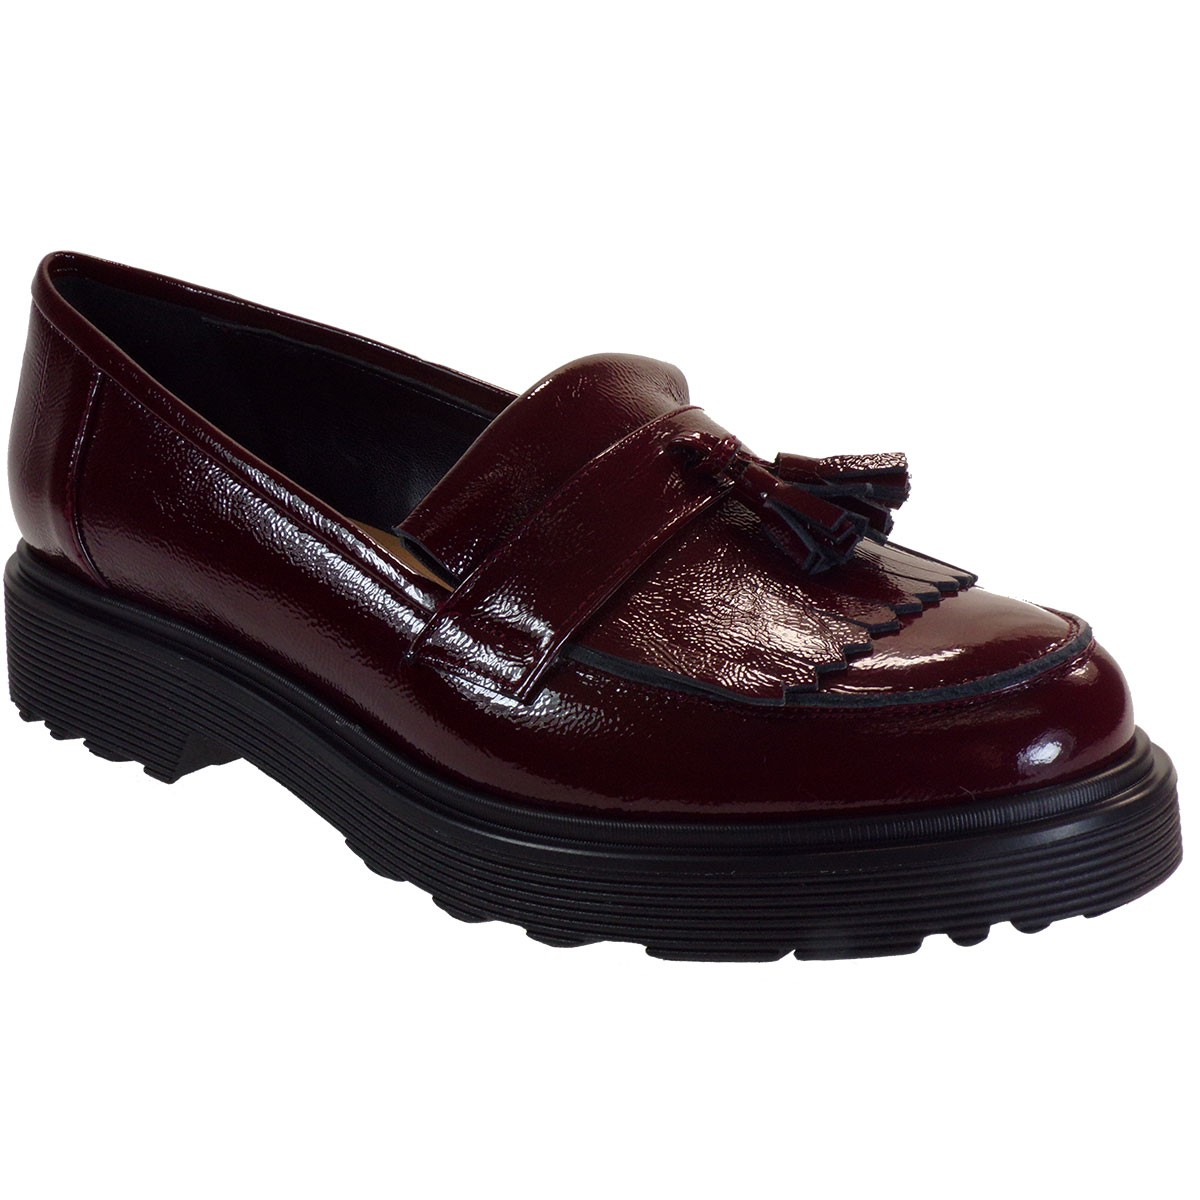 Fardoulis Shoes Γυναικεία Παπούτσια Μοκασίνι 3804 Μπορντώ Δέρμα Λουστρίνι